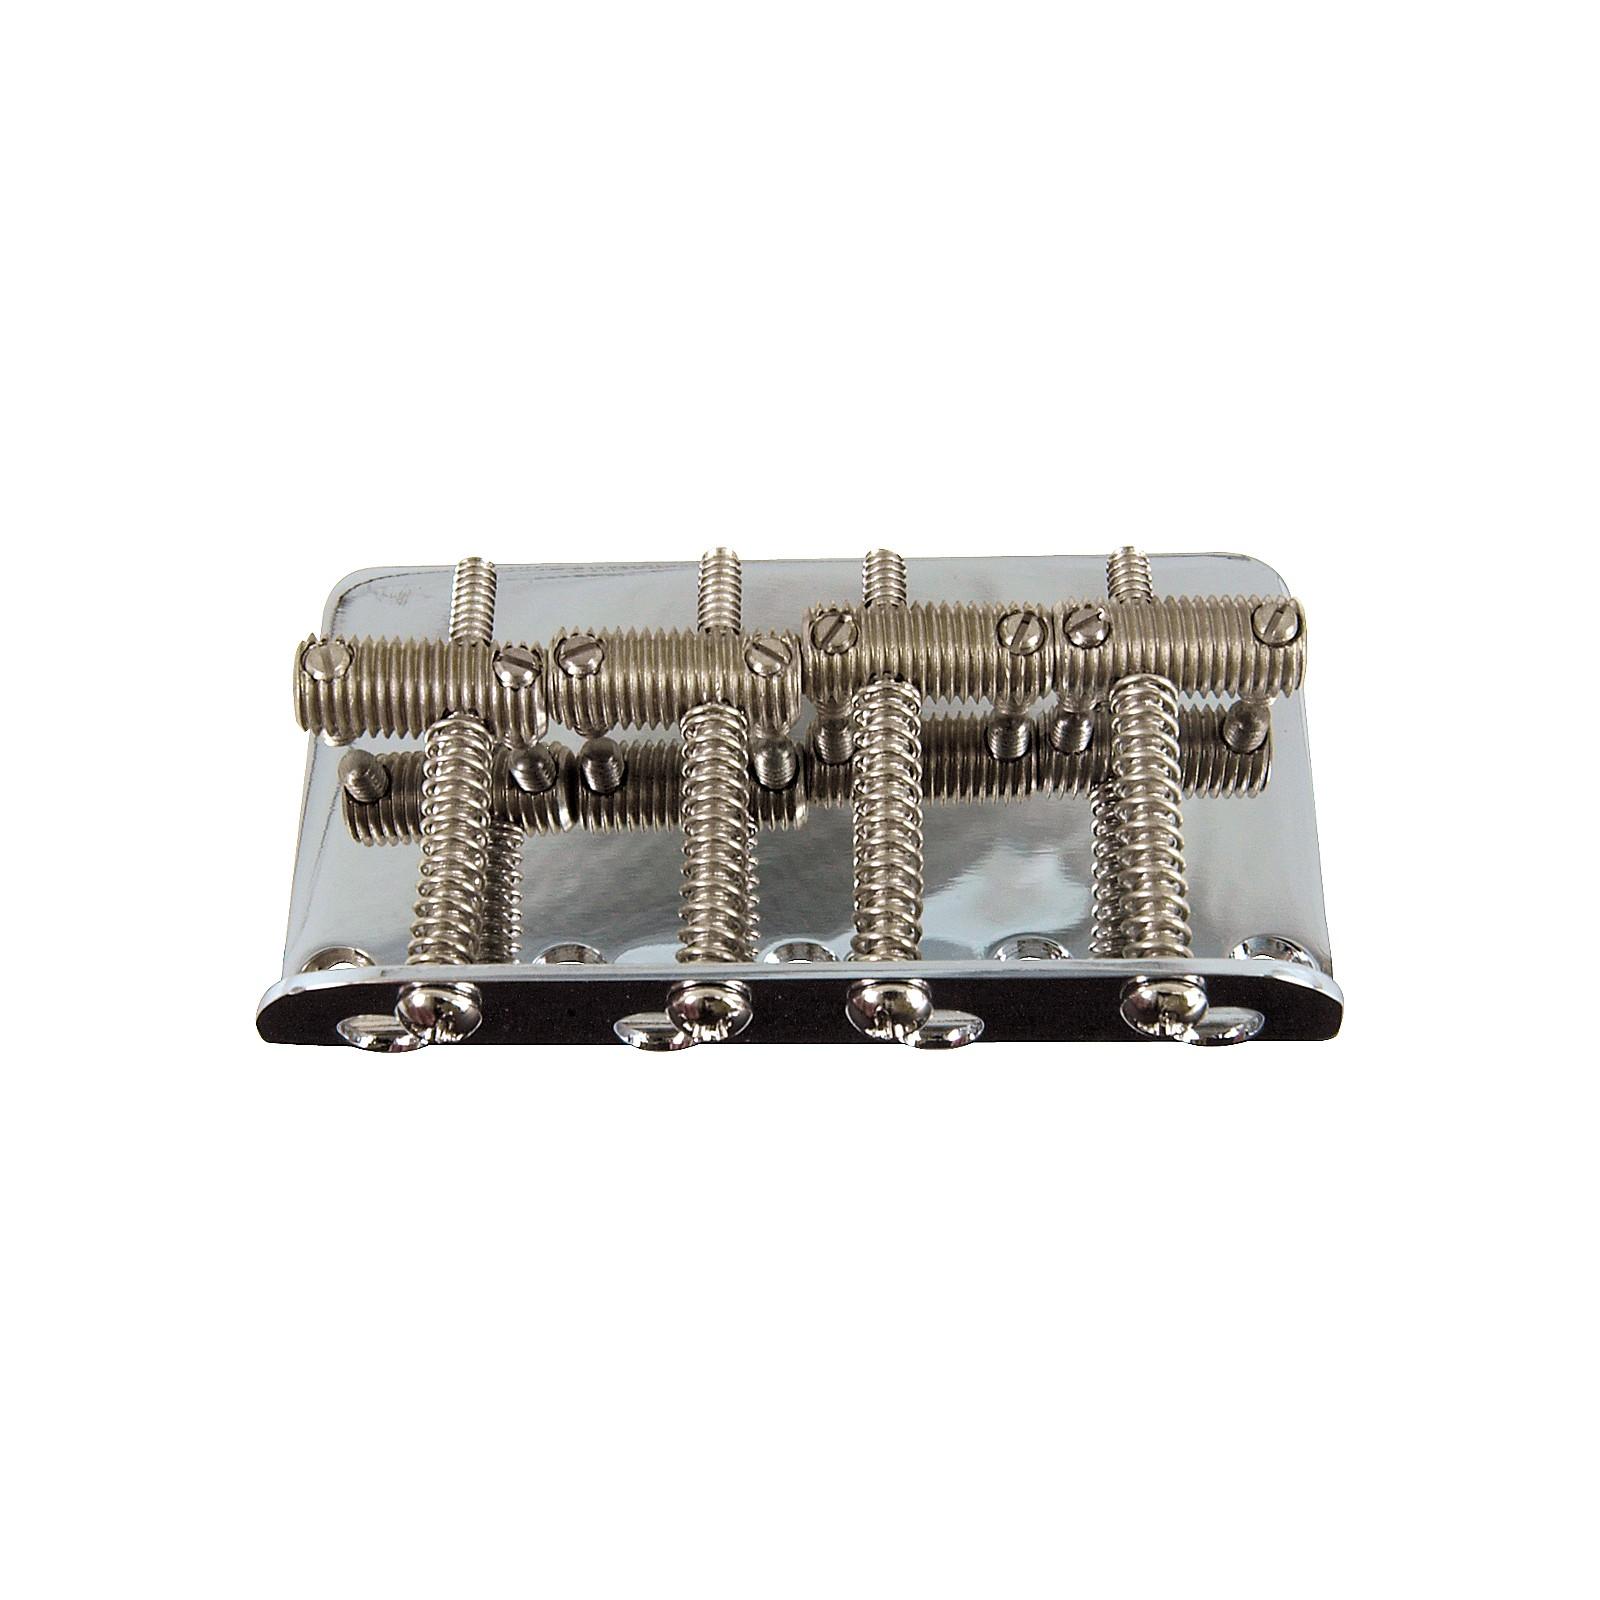 Fender P Bass/J Bass Vintage Bridge Assembly